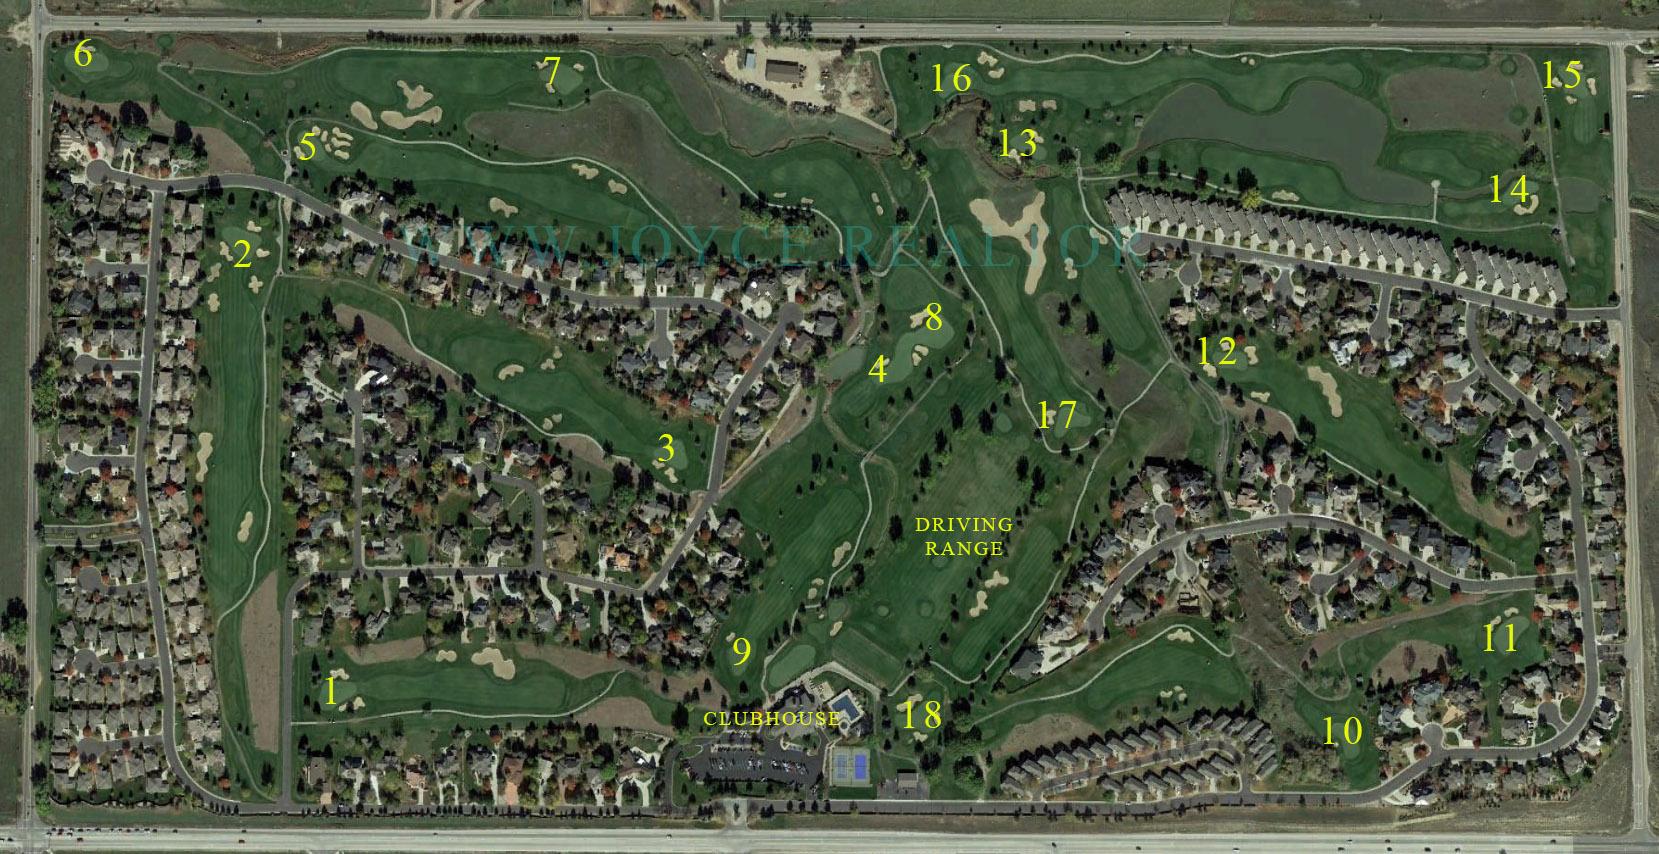 Ptarmigan Fort Collins Golf Course Layout Map